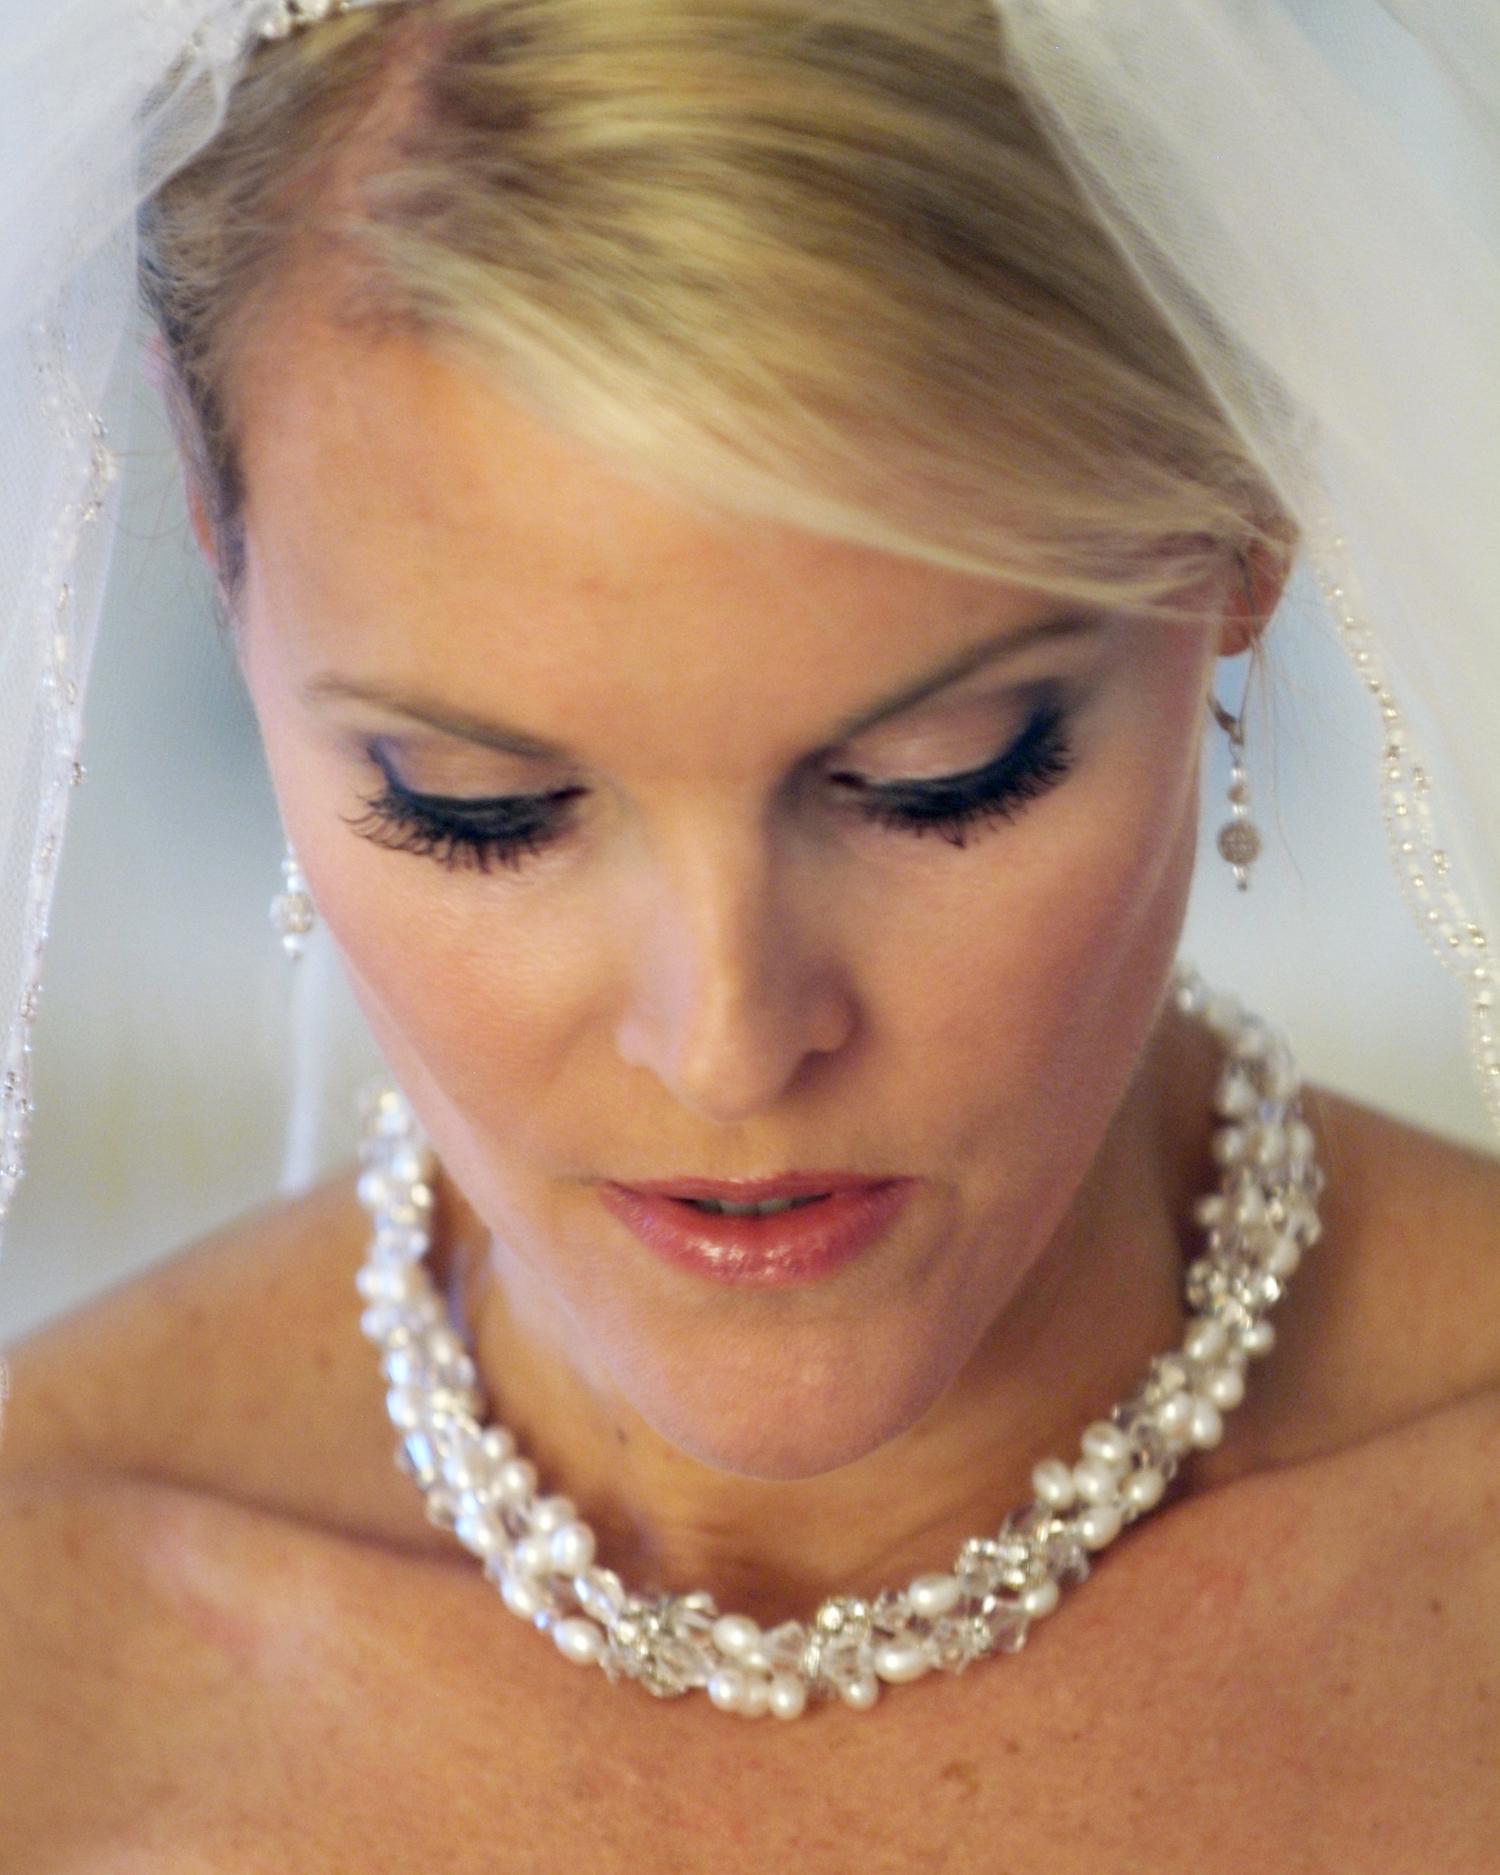 Rick-Ferro-Bridal-Close-Up-Portrait.jpg